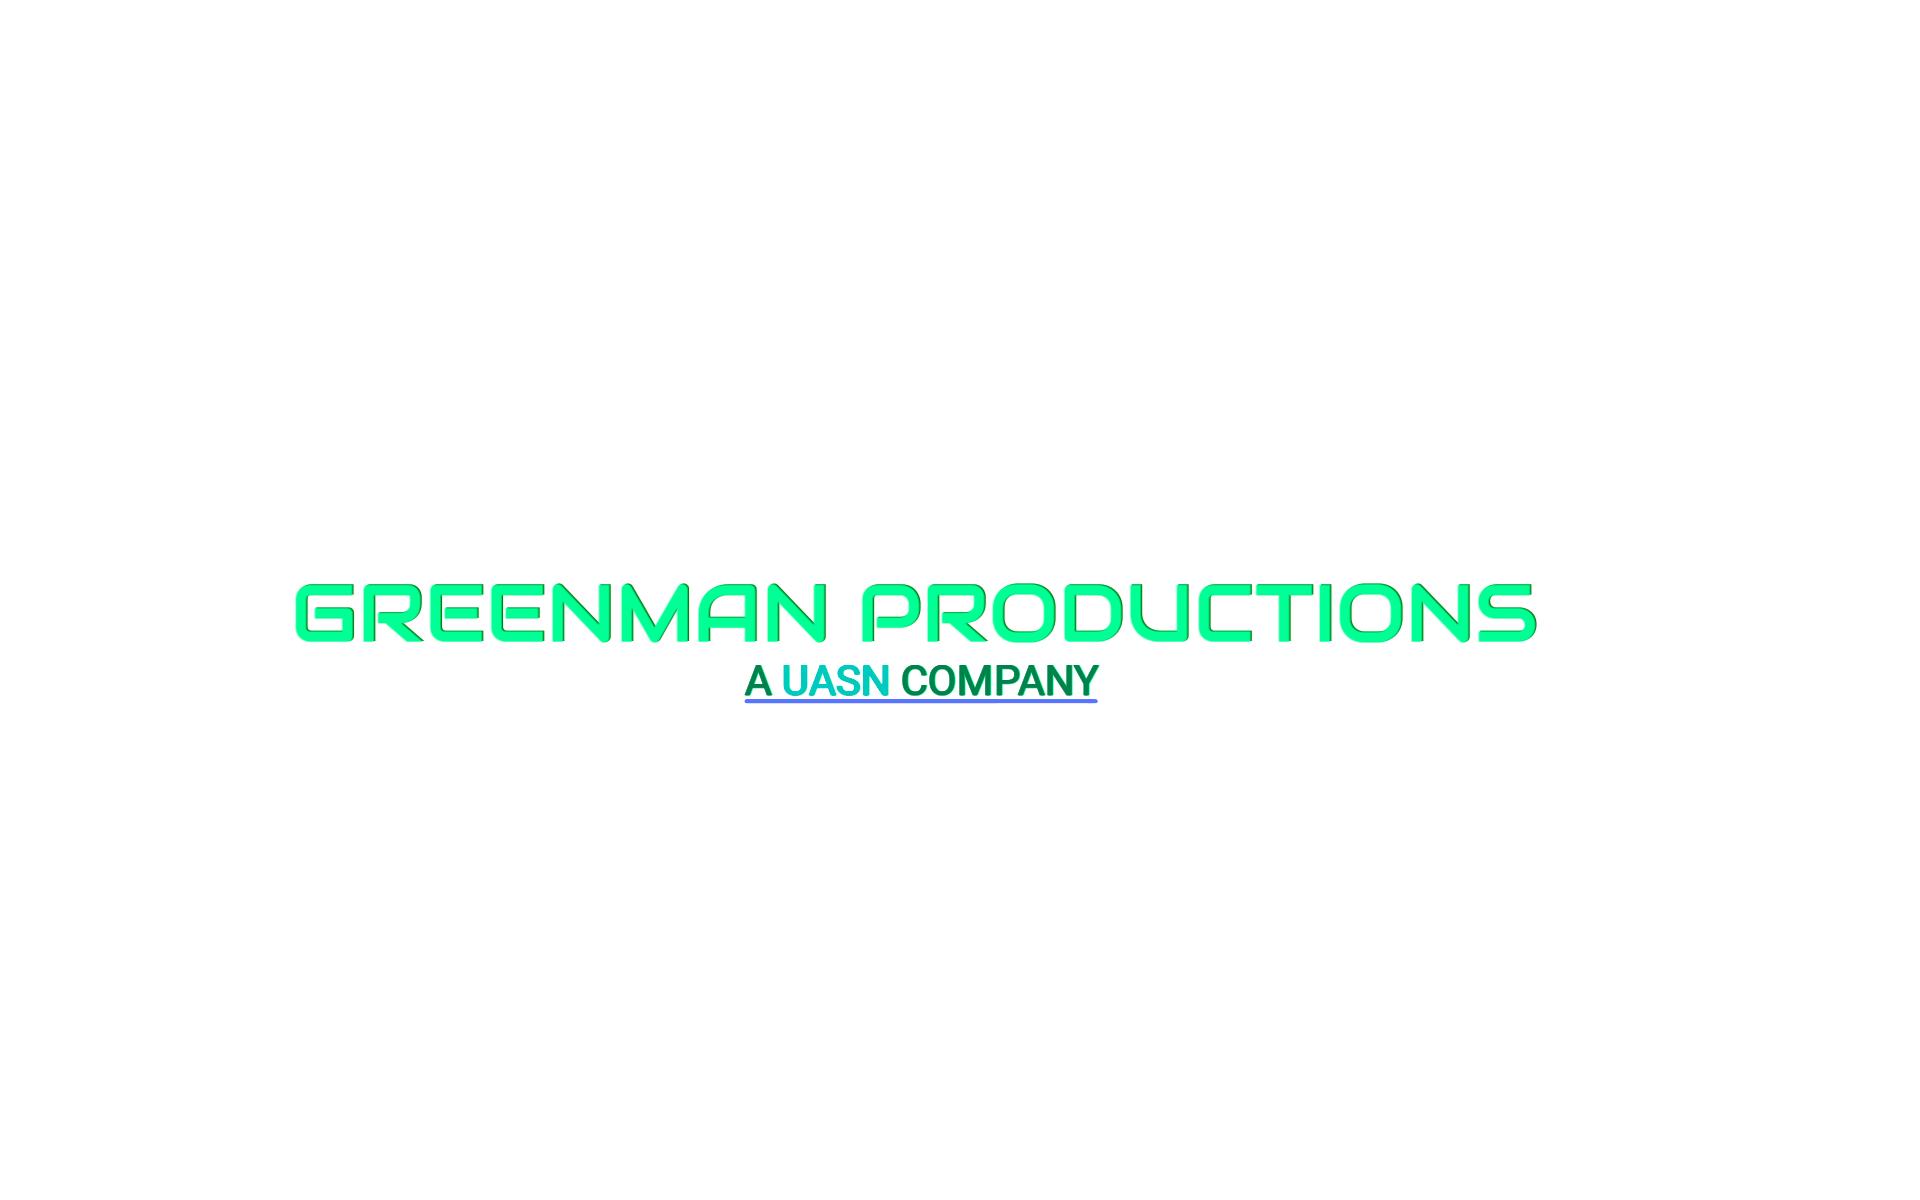 Greenman Productions